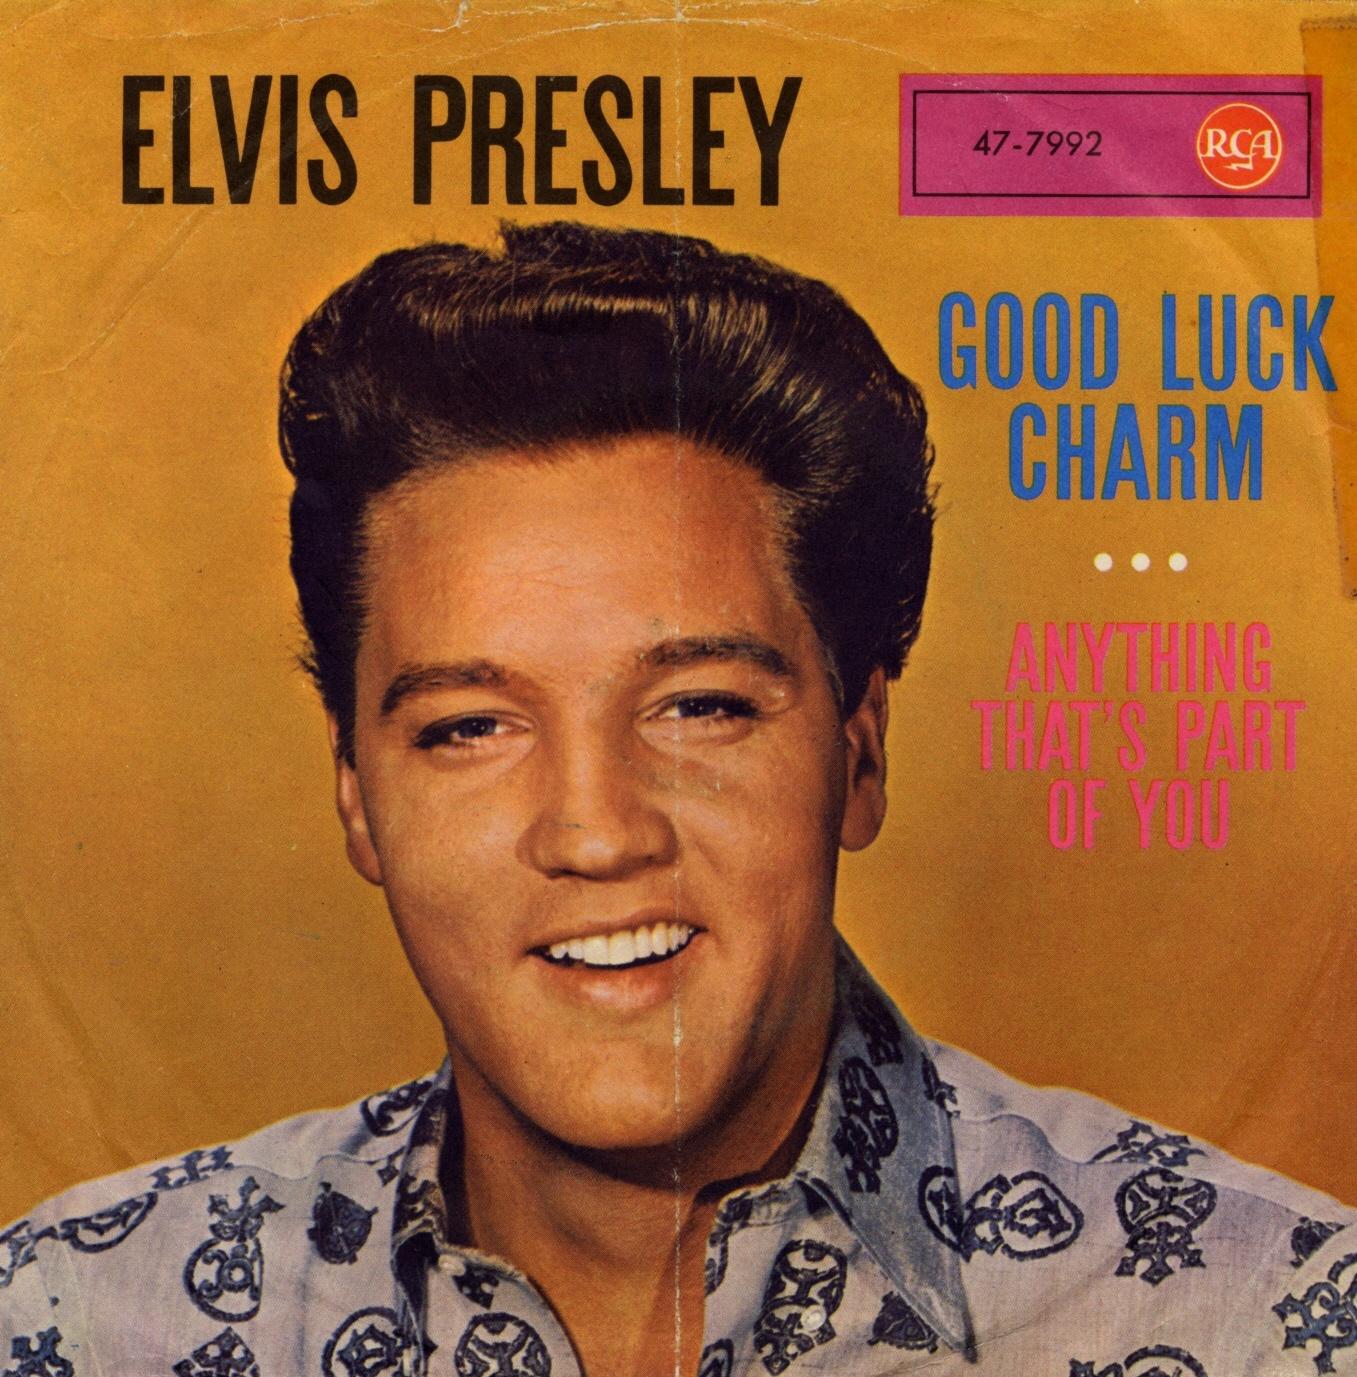 Good luck charm (Foto: Elvis Presley)